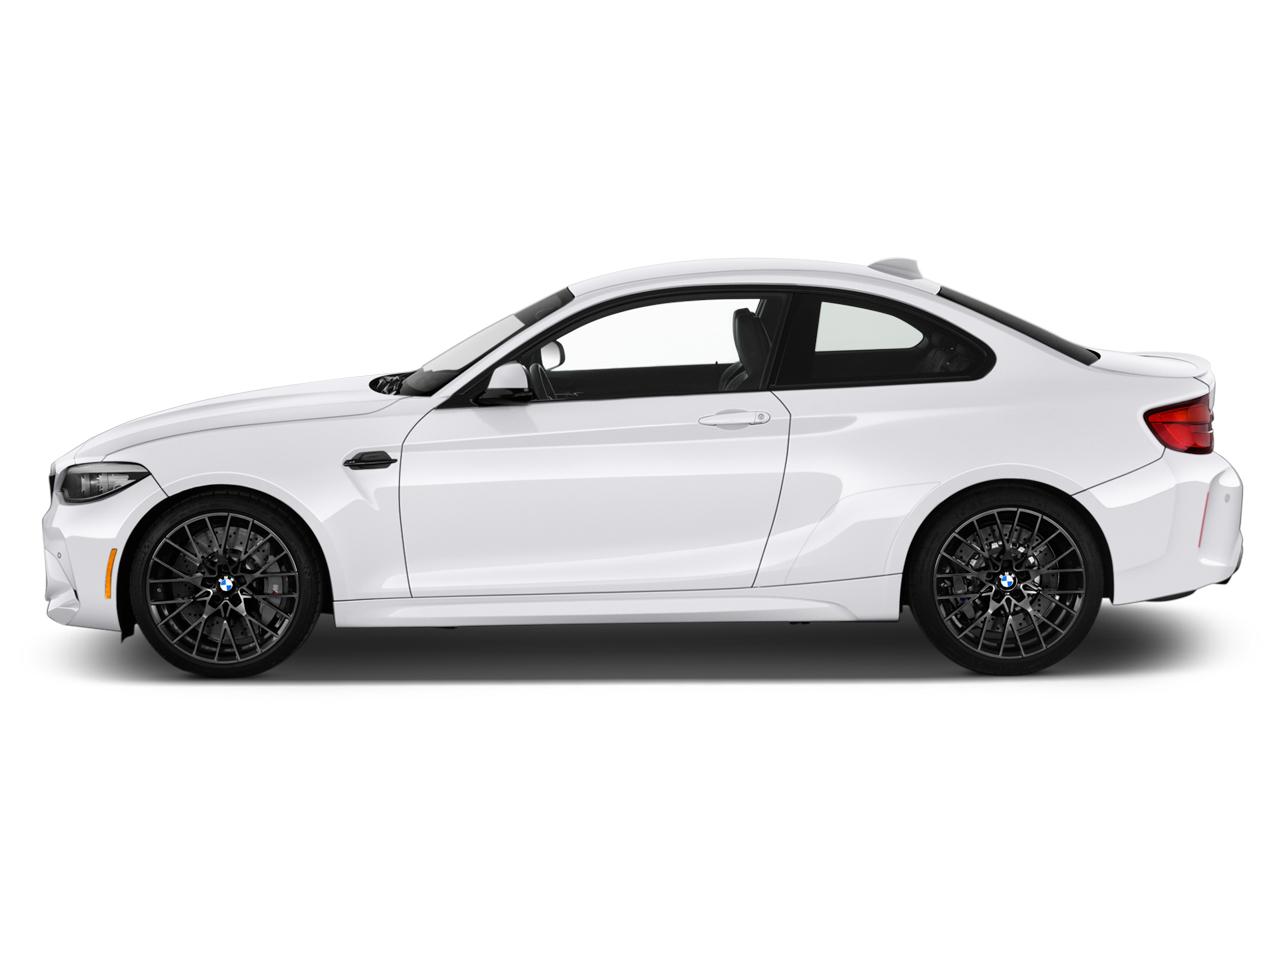 2021 Bmw 2 Series Auto Daily News